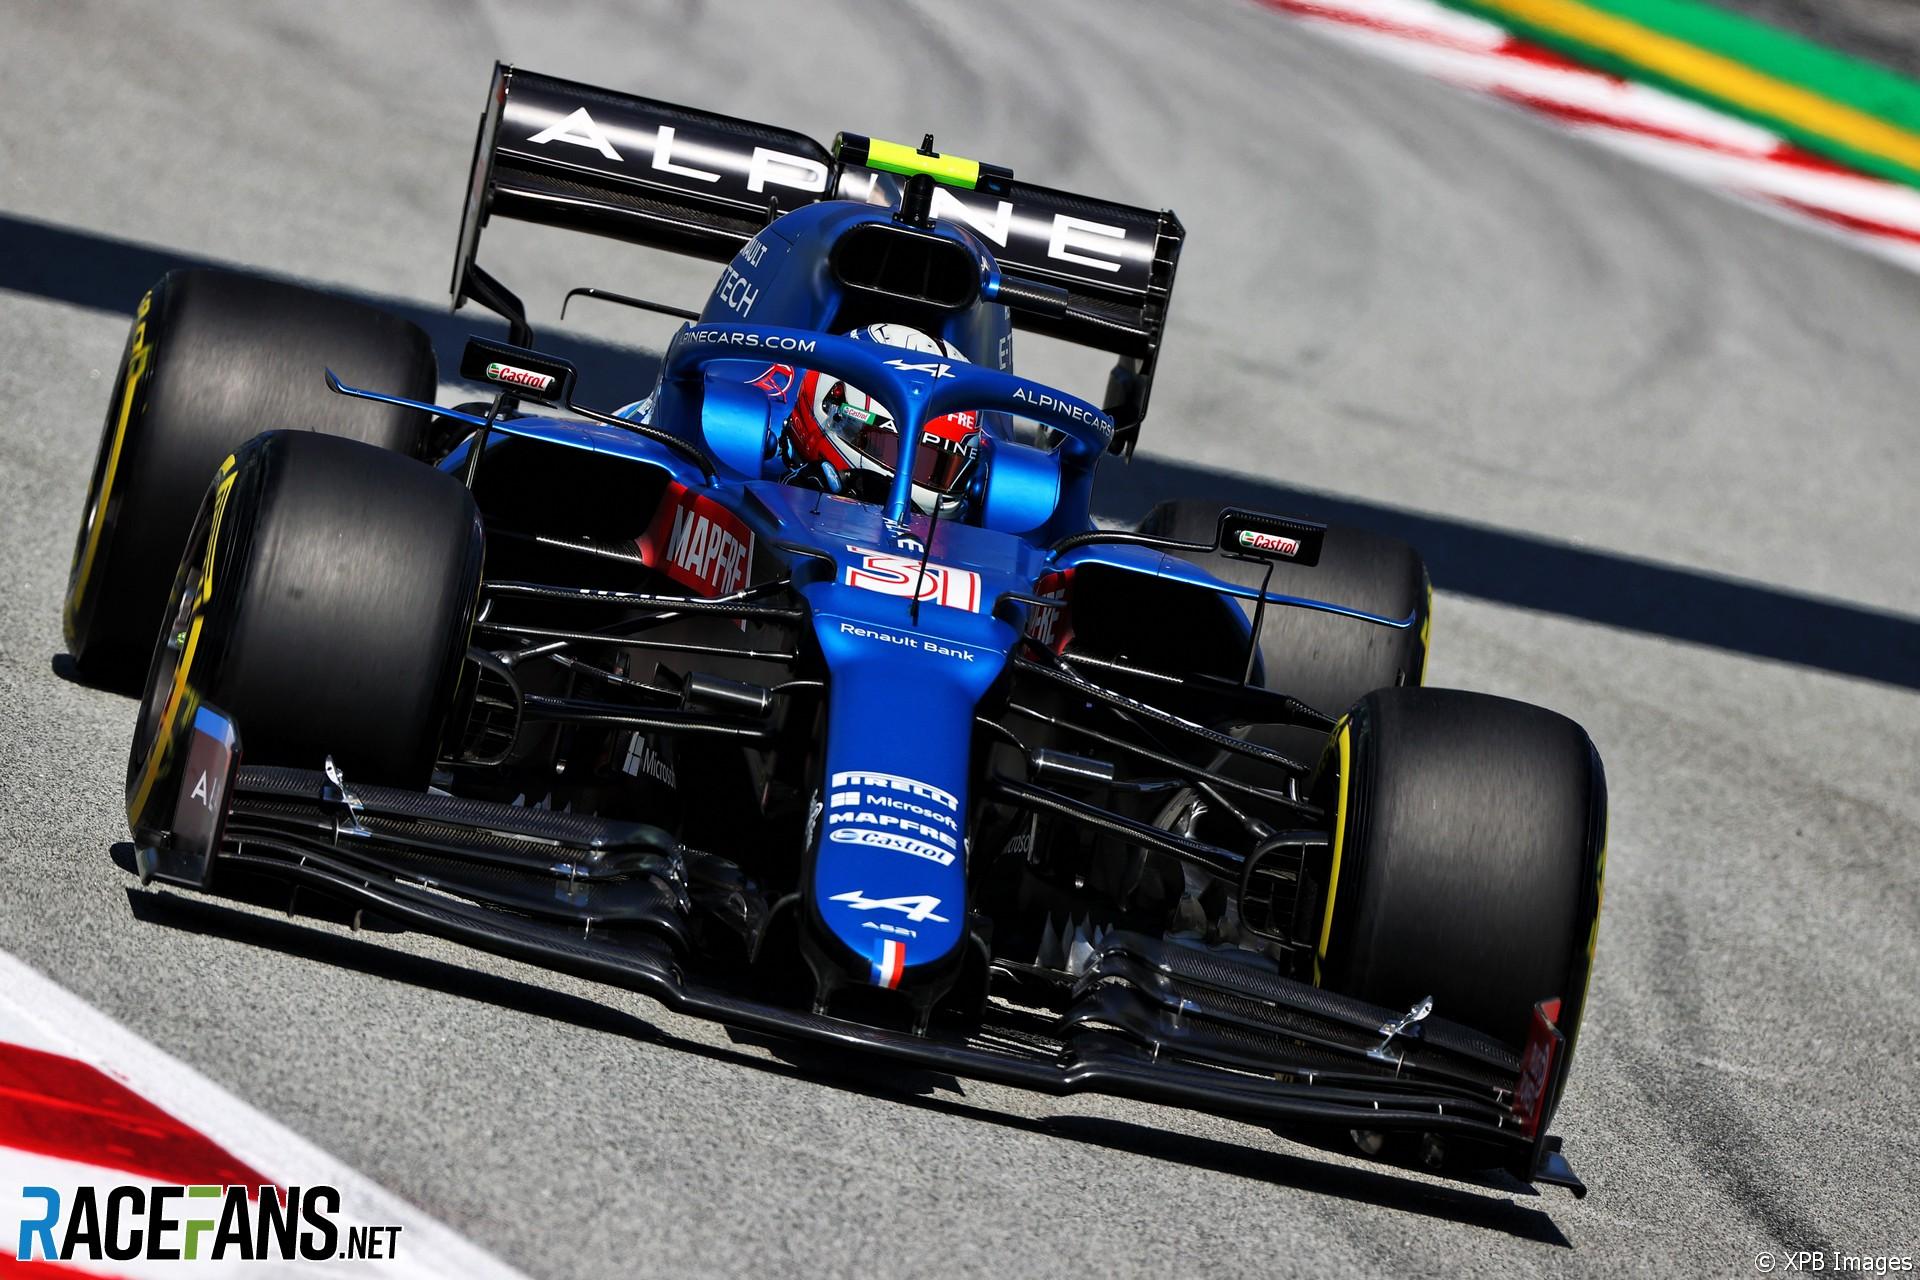 Esteban Ocon, Alpine, Circuit de Catalunya, 2021